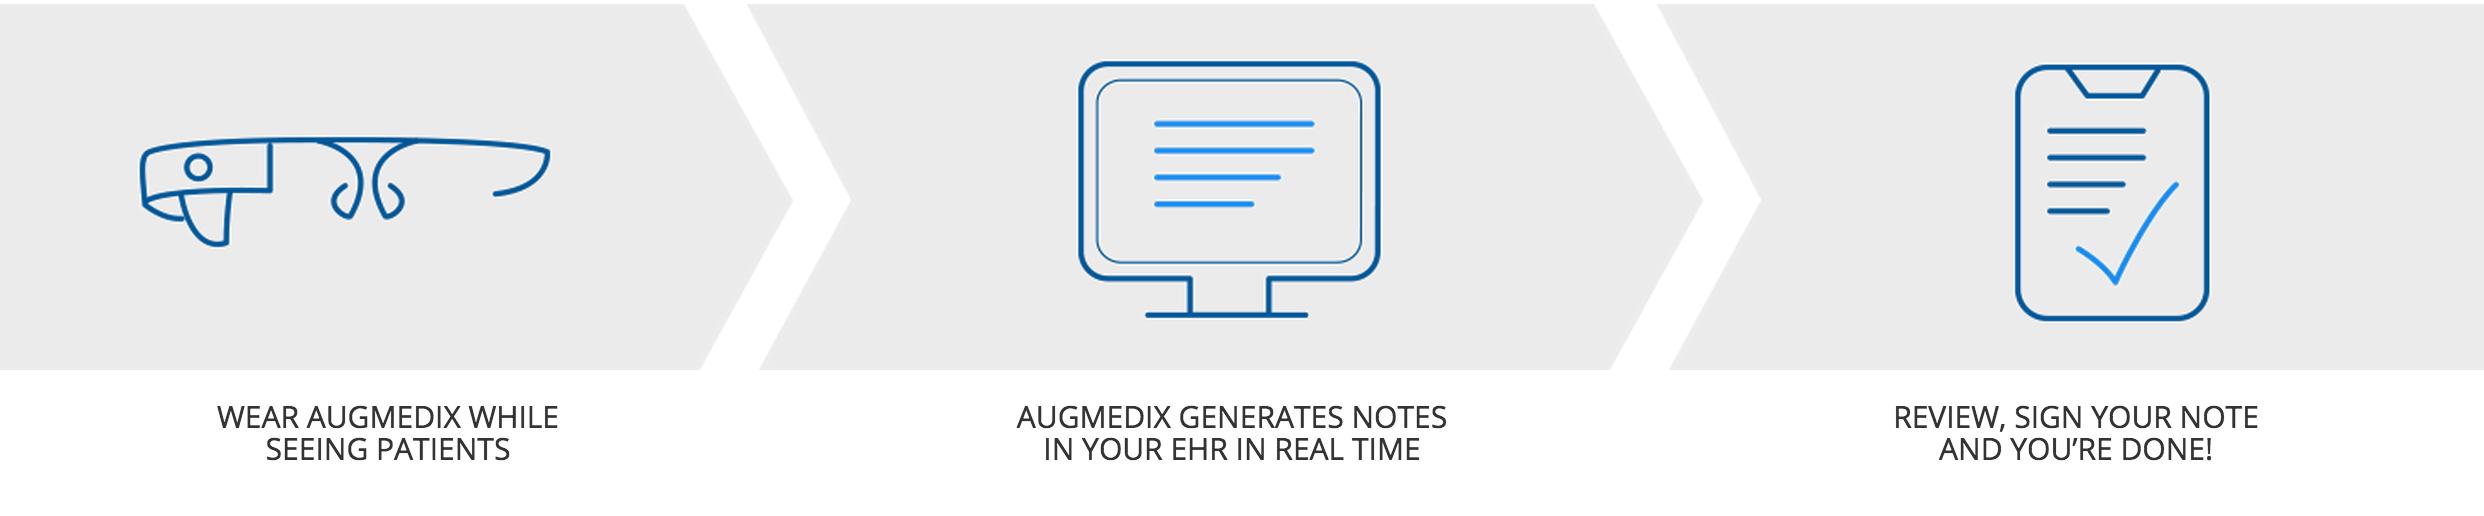 Augmedix & Google glass -  esanté